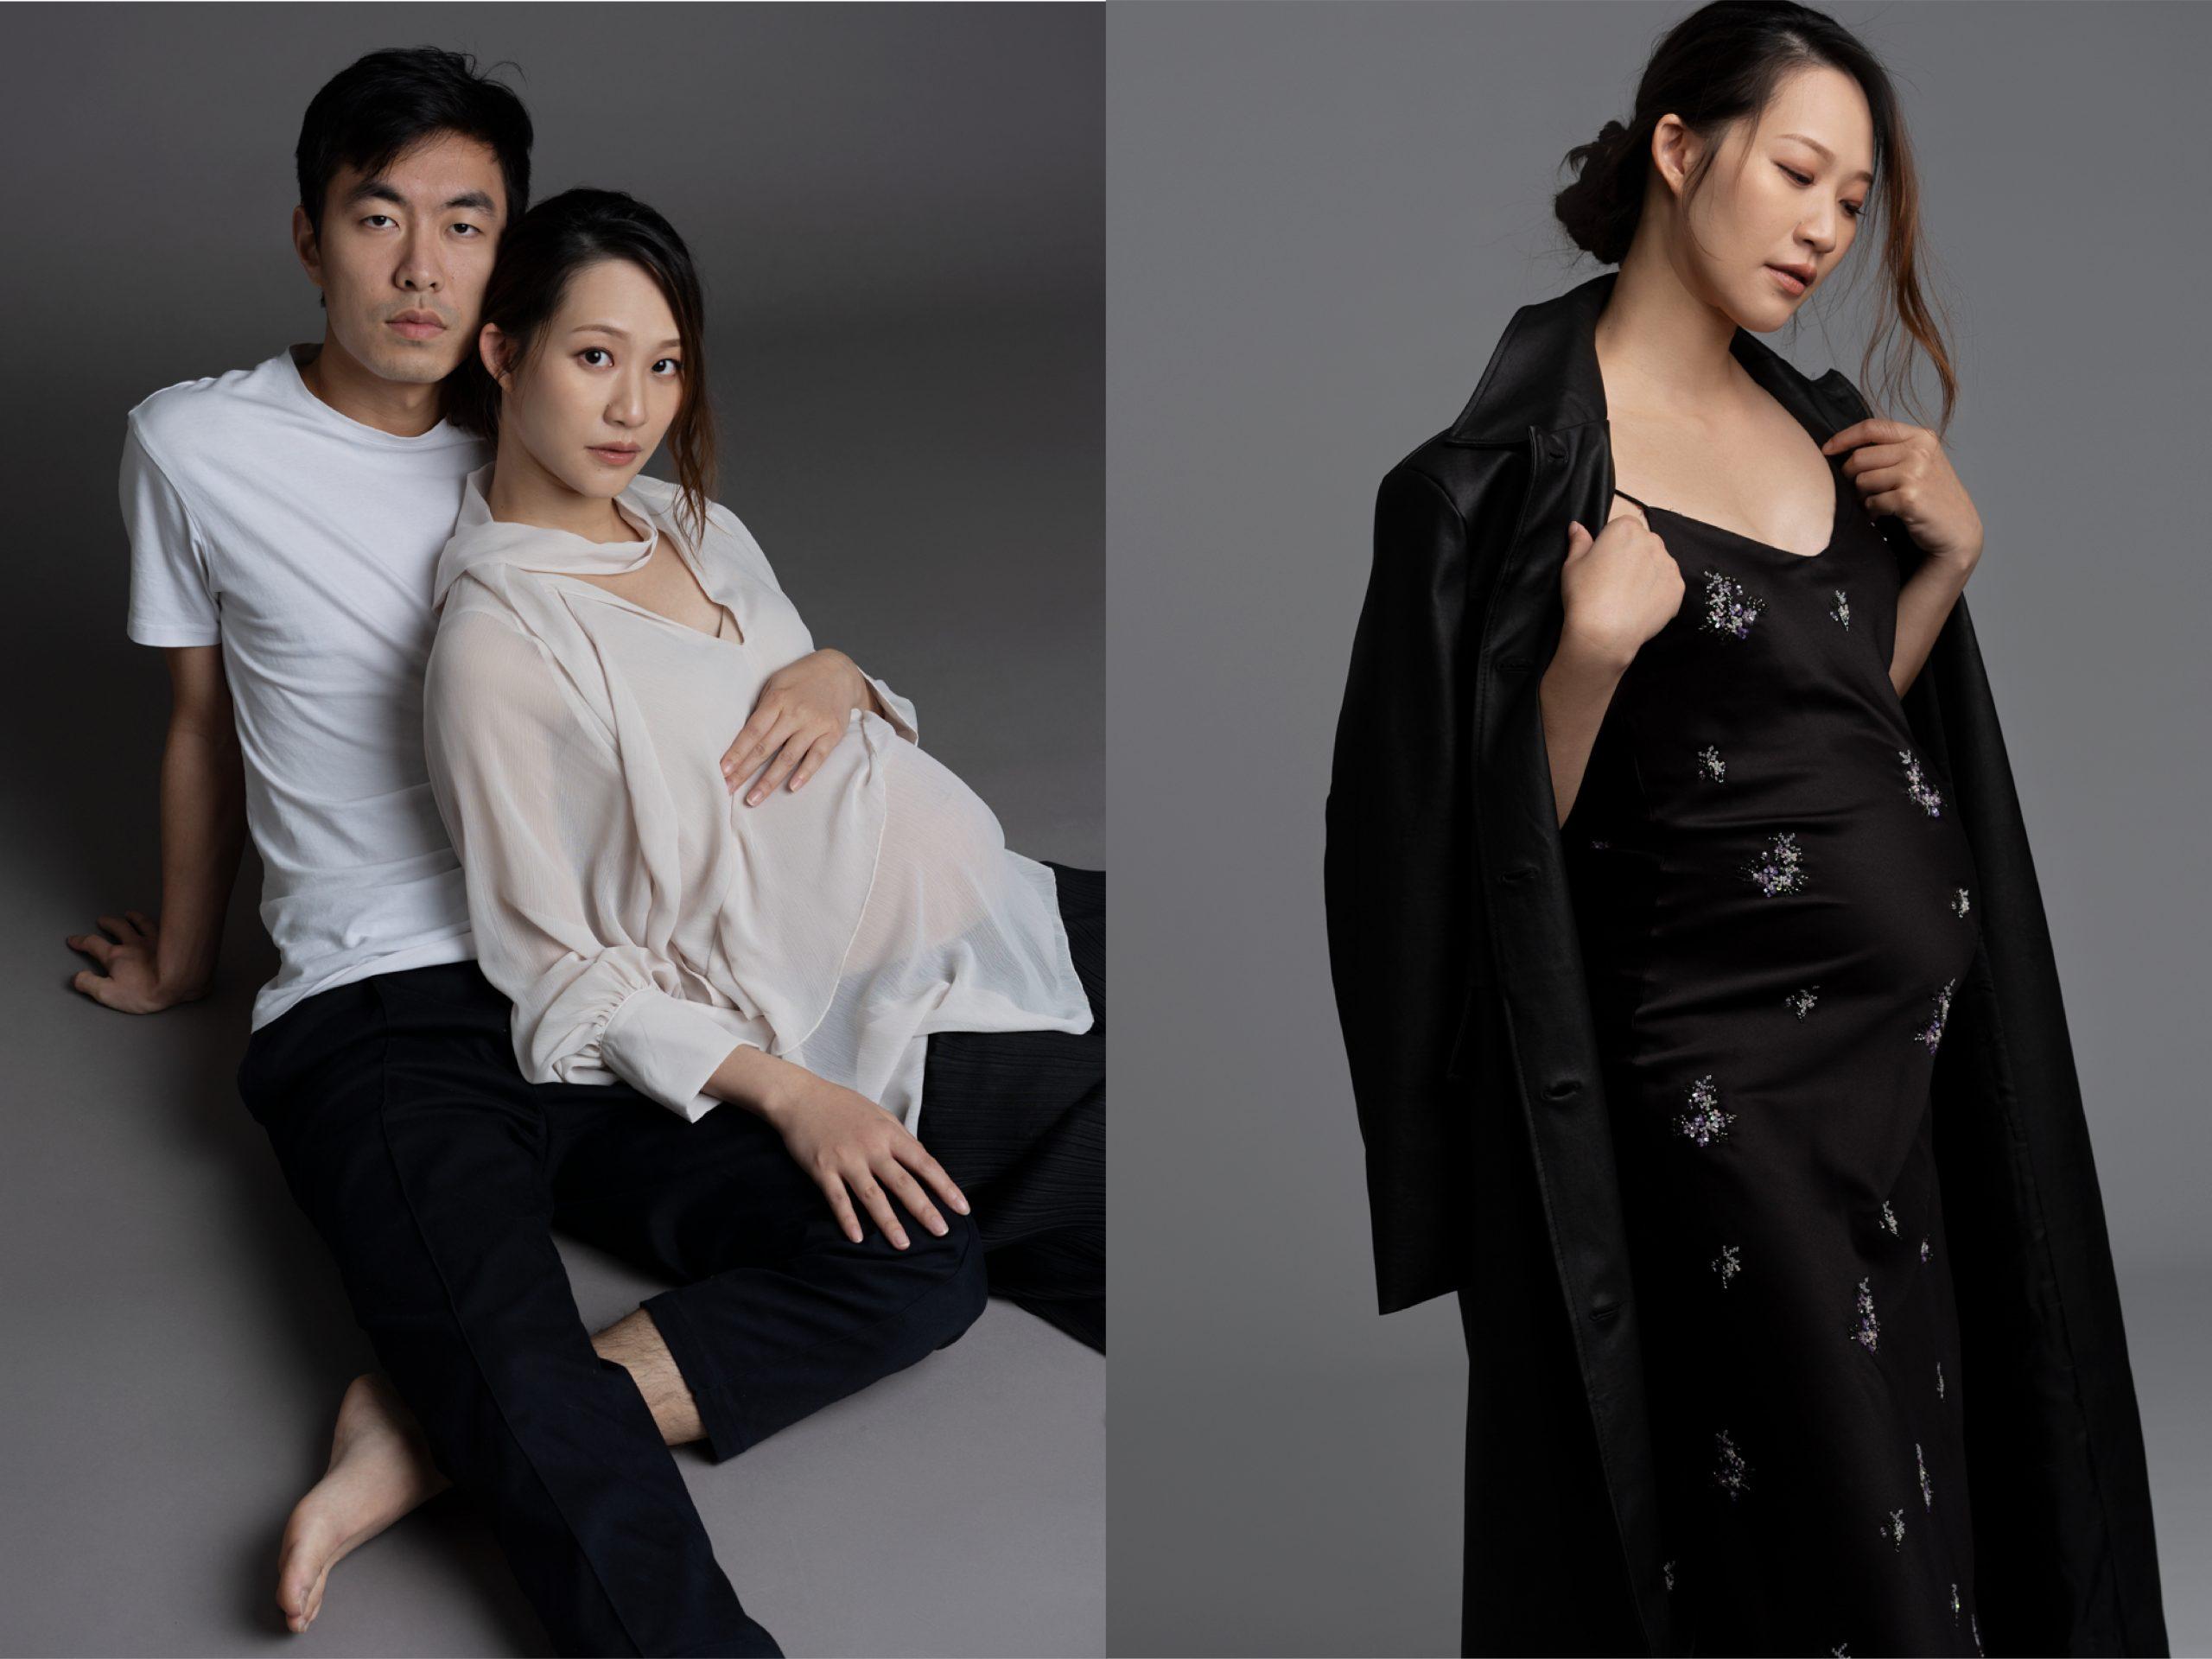 hk hong kong maternity photography fashion editorial fine art